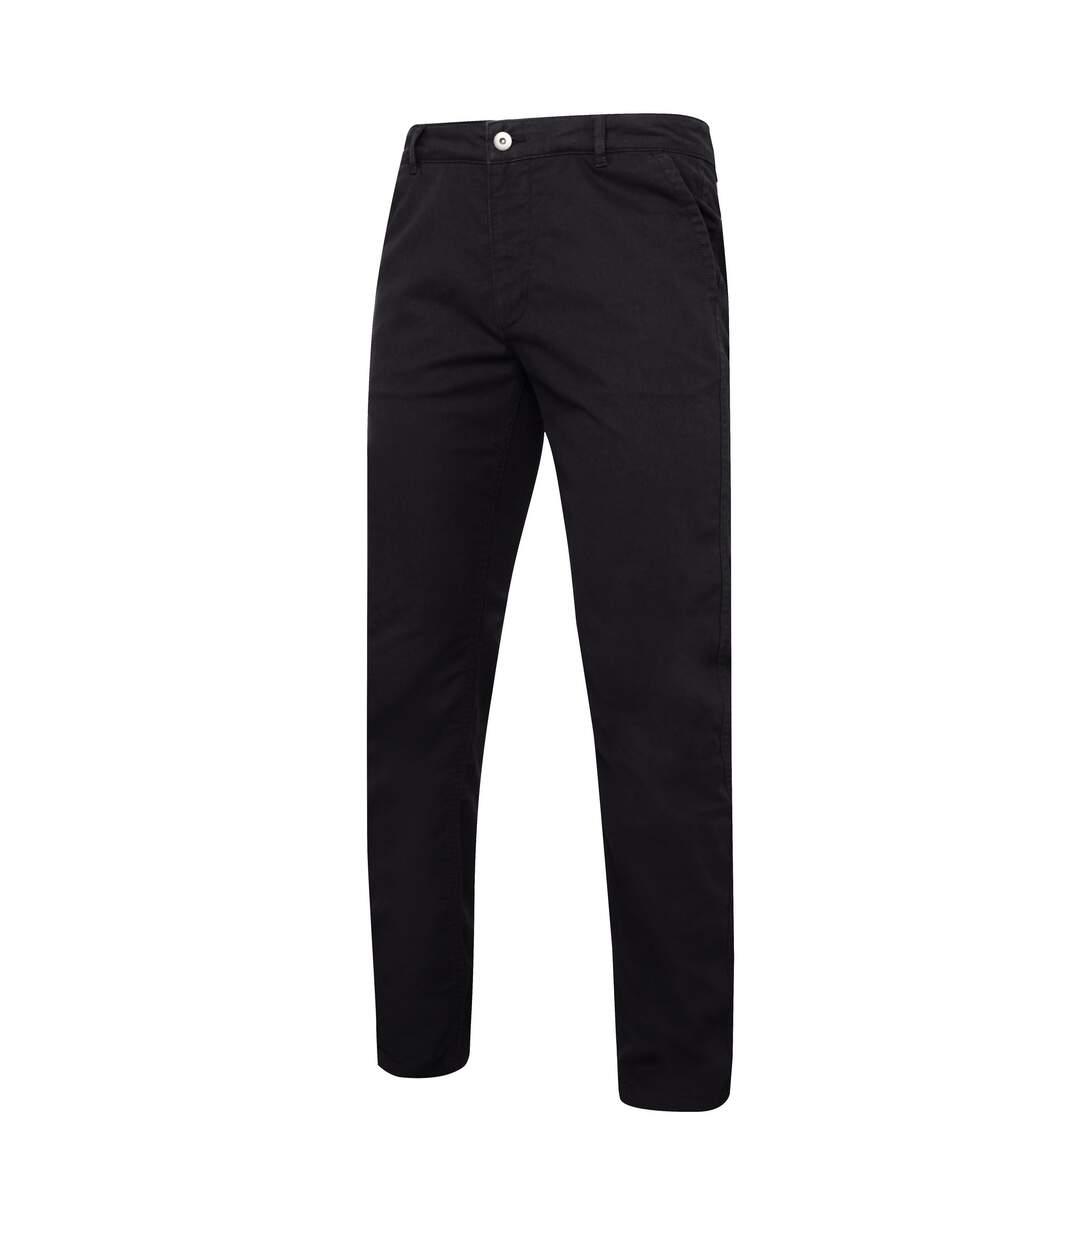 Asquith & Fox Mens Slim Fit Cotton Chino Trousers (Navy) - UTRW5355